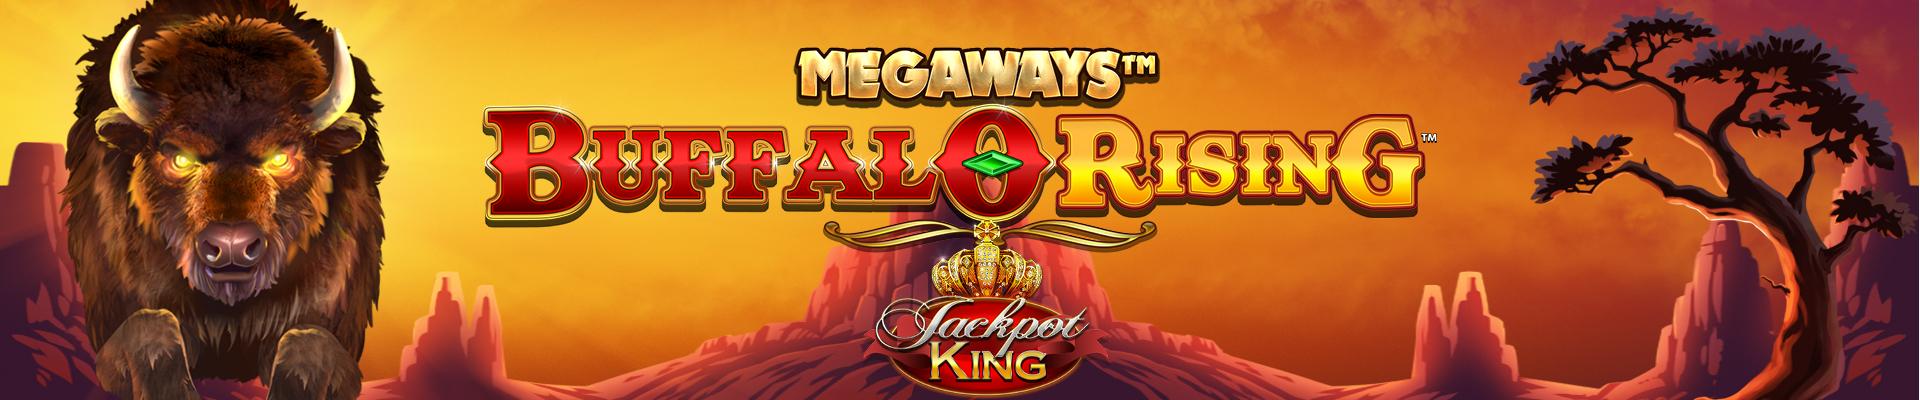 Buffalo Rising Megaways Jackpot King slot